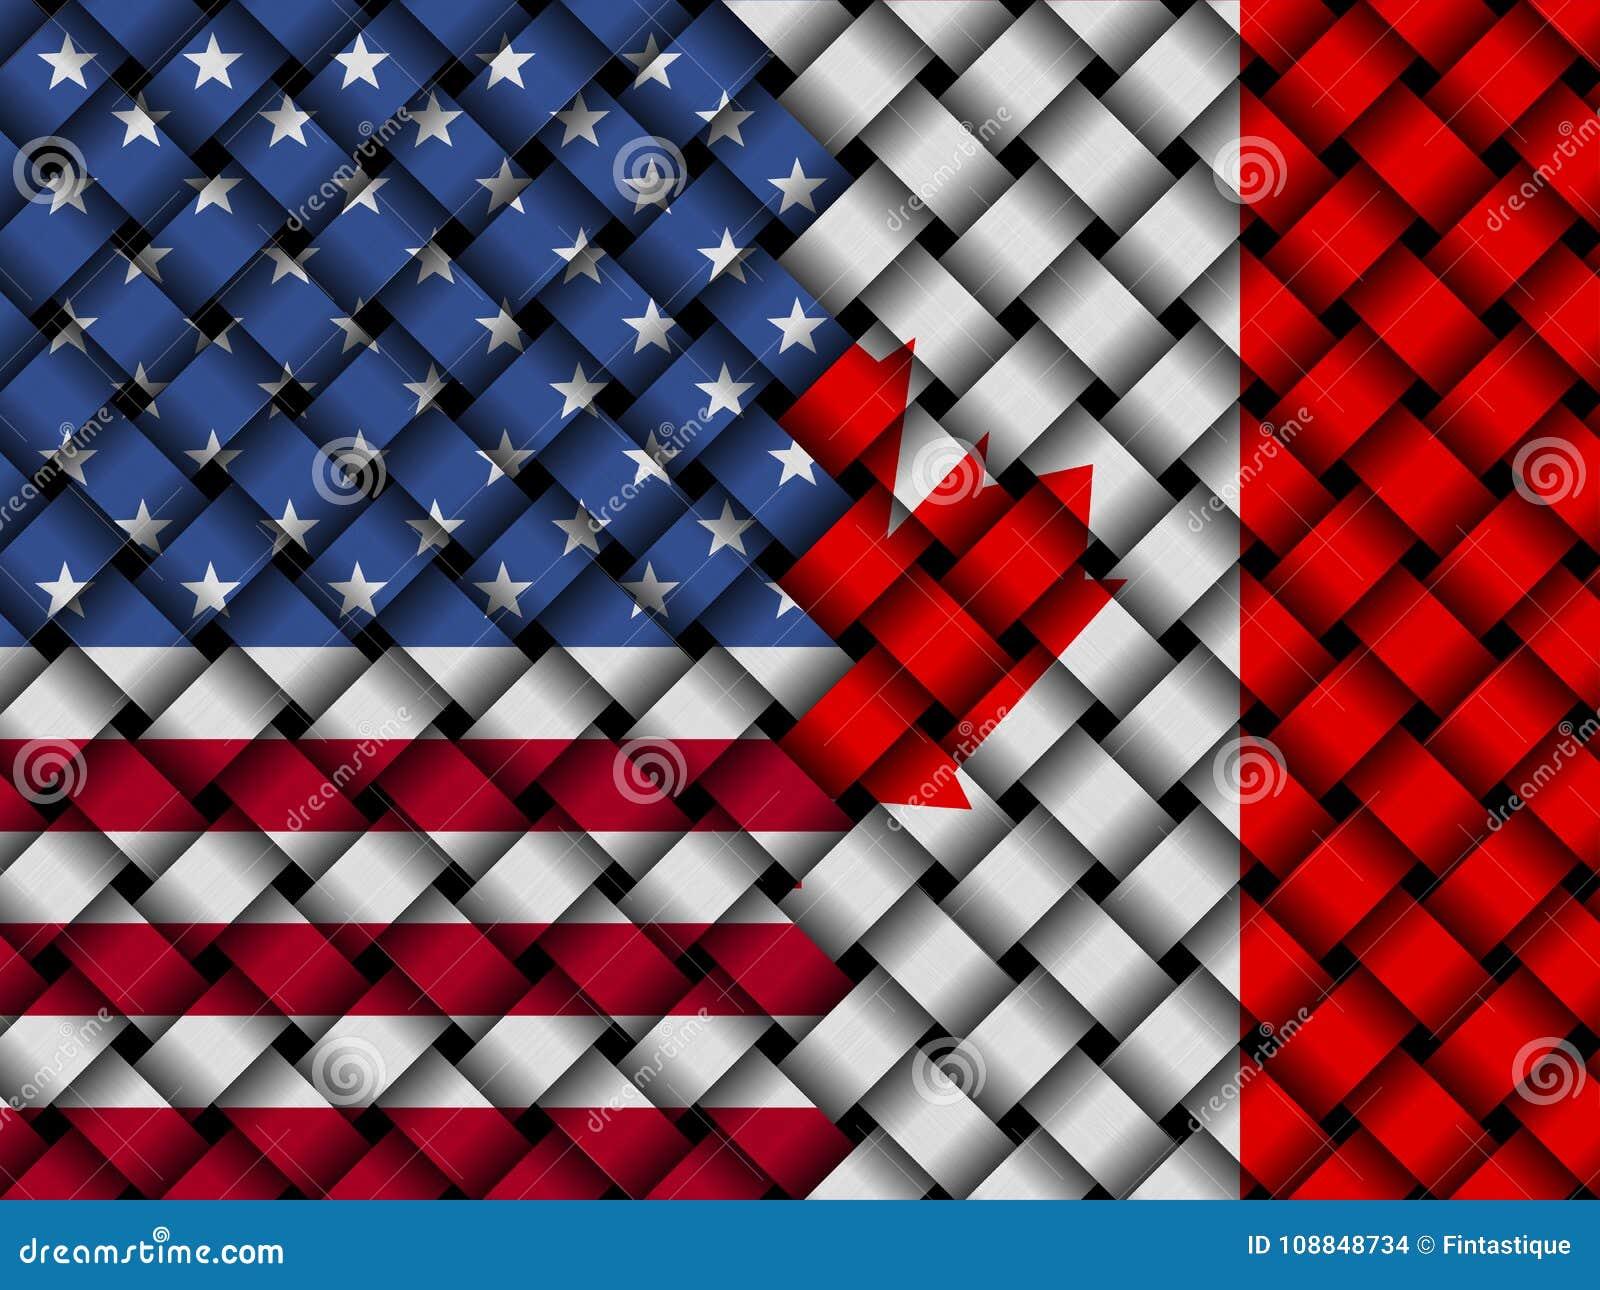 USA Canadian interwoven flags 3d illustration